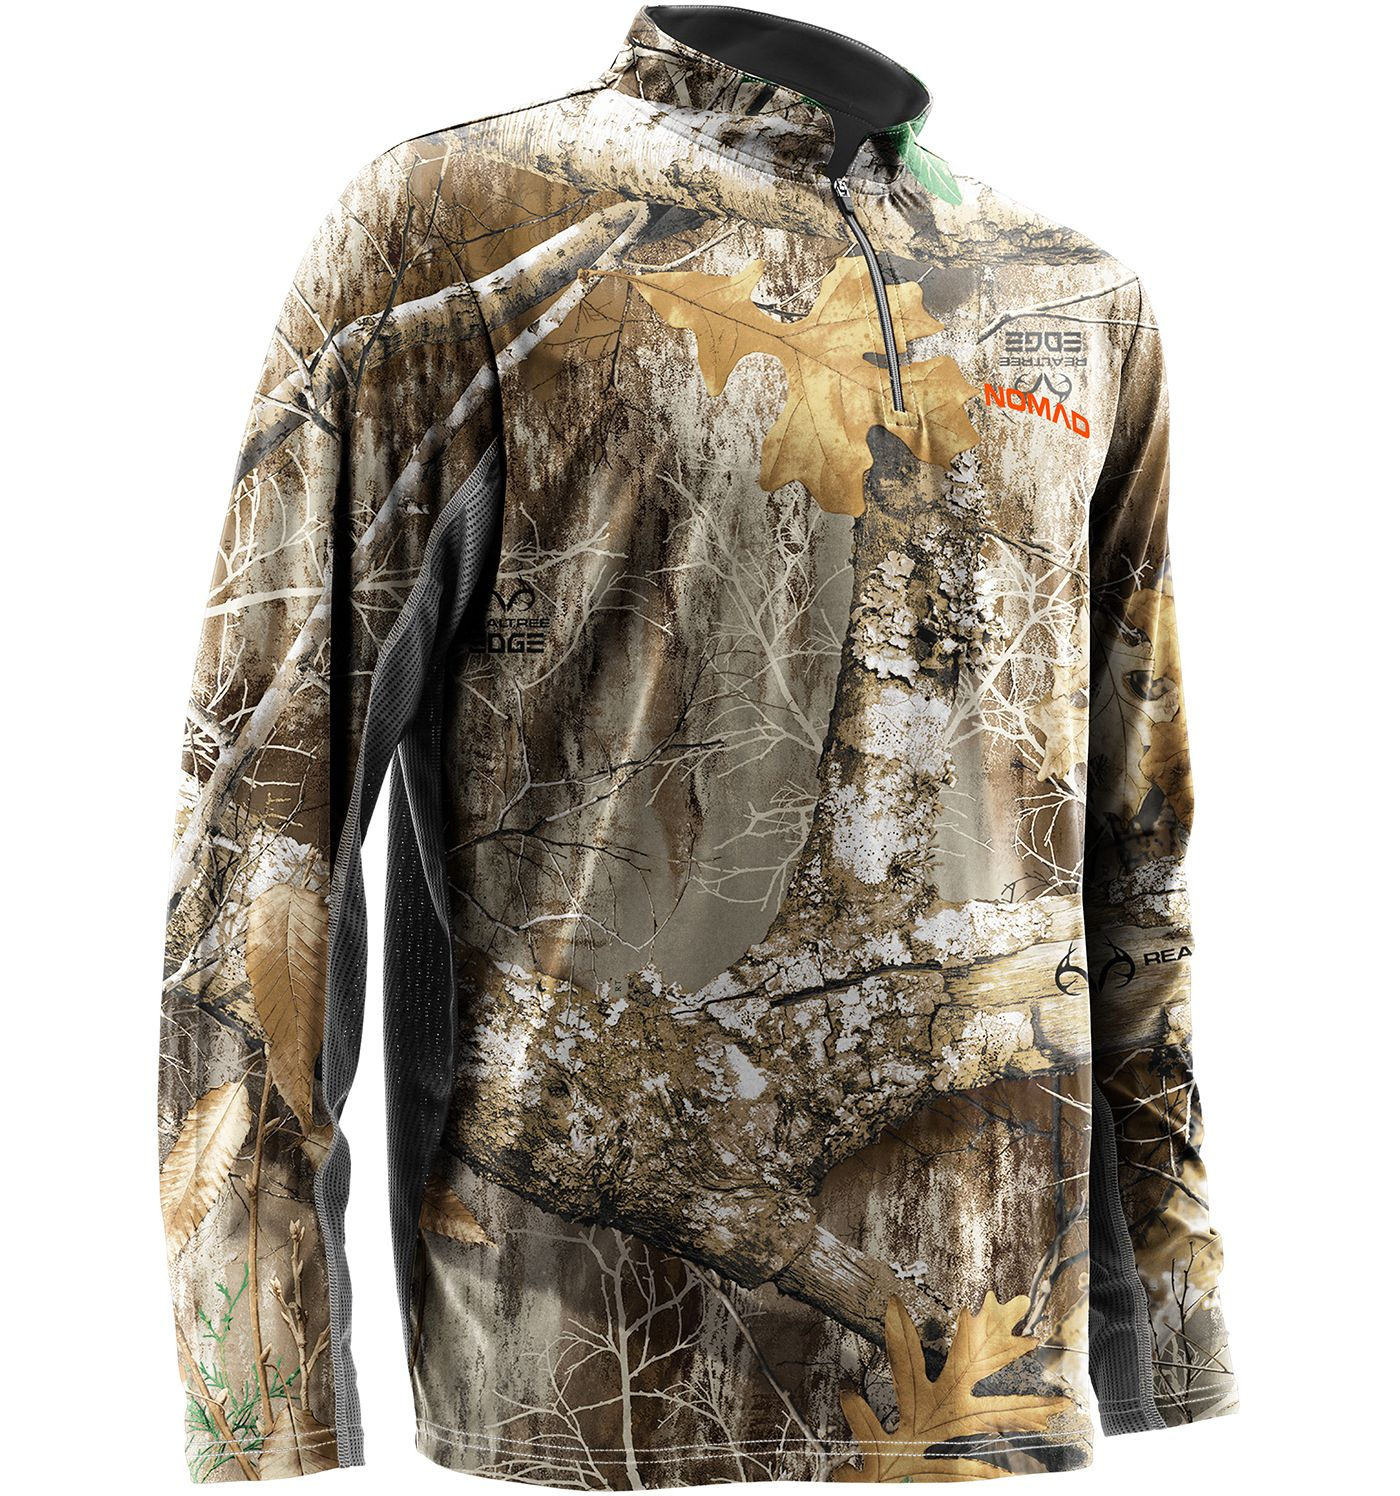 NOMAD Men's Quarter Zip Long Sleeve Hunting Shirt